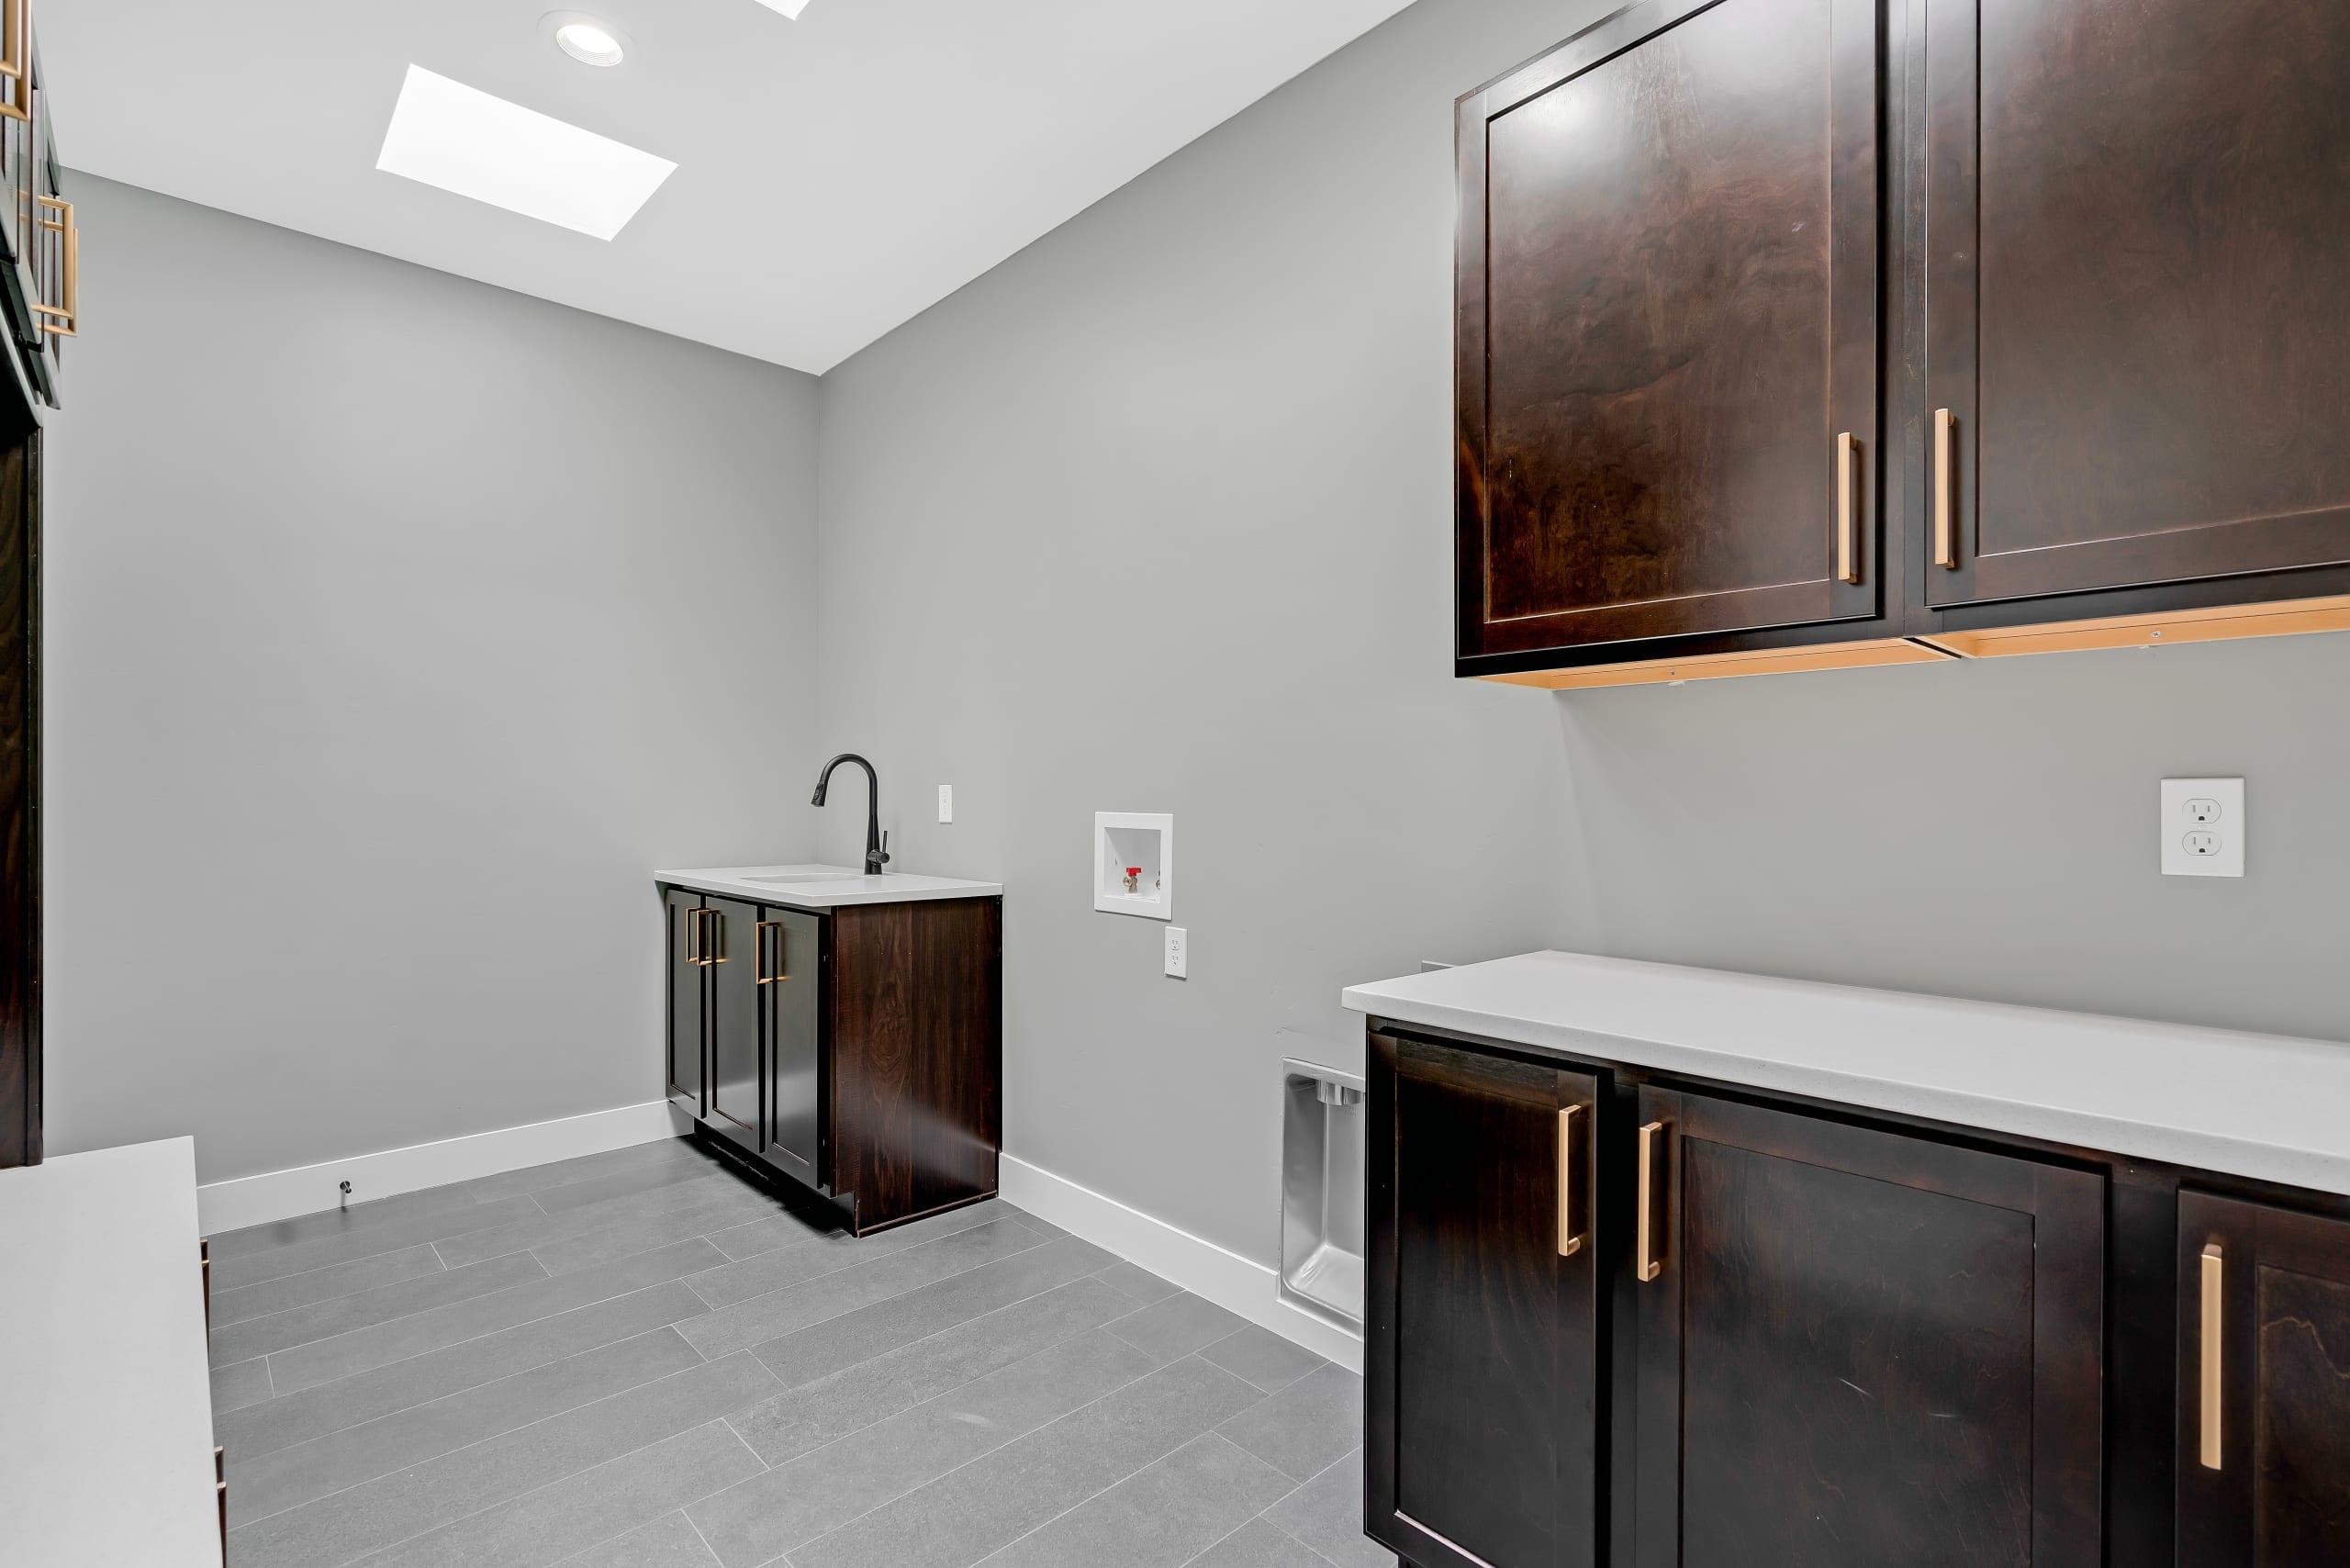 Washroom - Washer and Dryer ready - Utility Sink